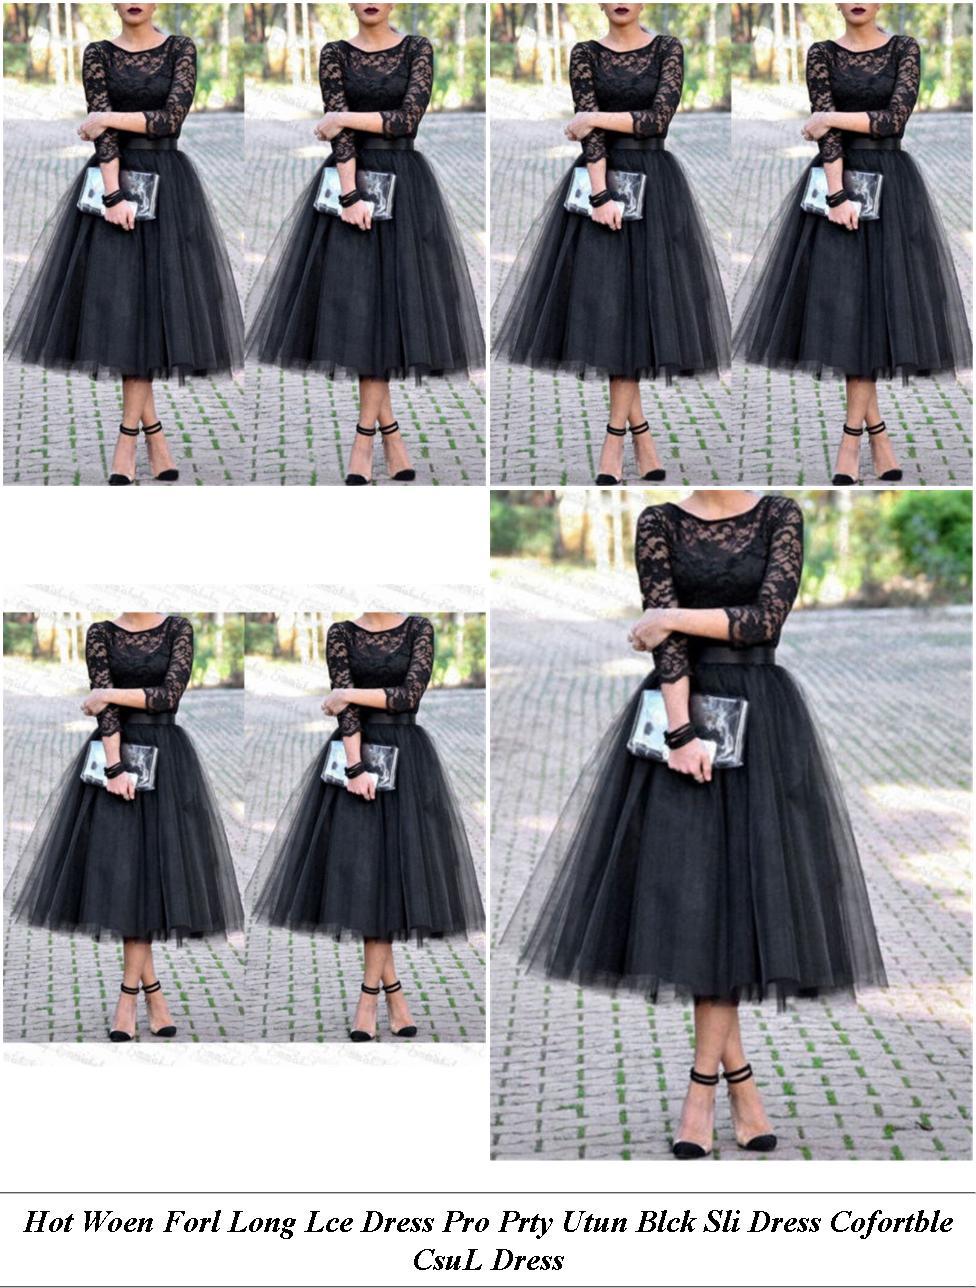 Sequin Fringe Dress Zara - Fashion Store Near Me - Woman Long Dress Design